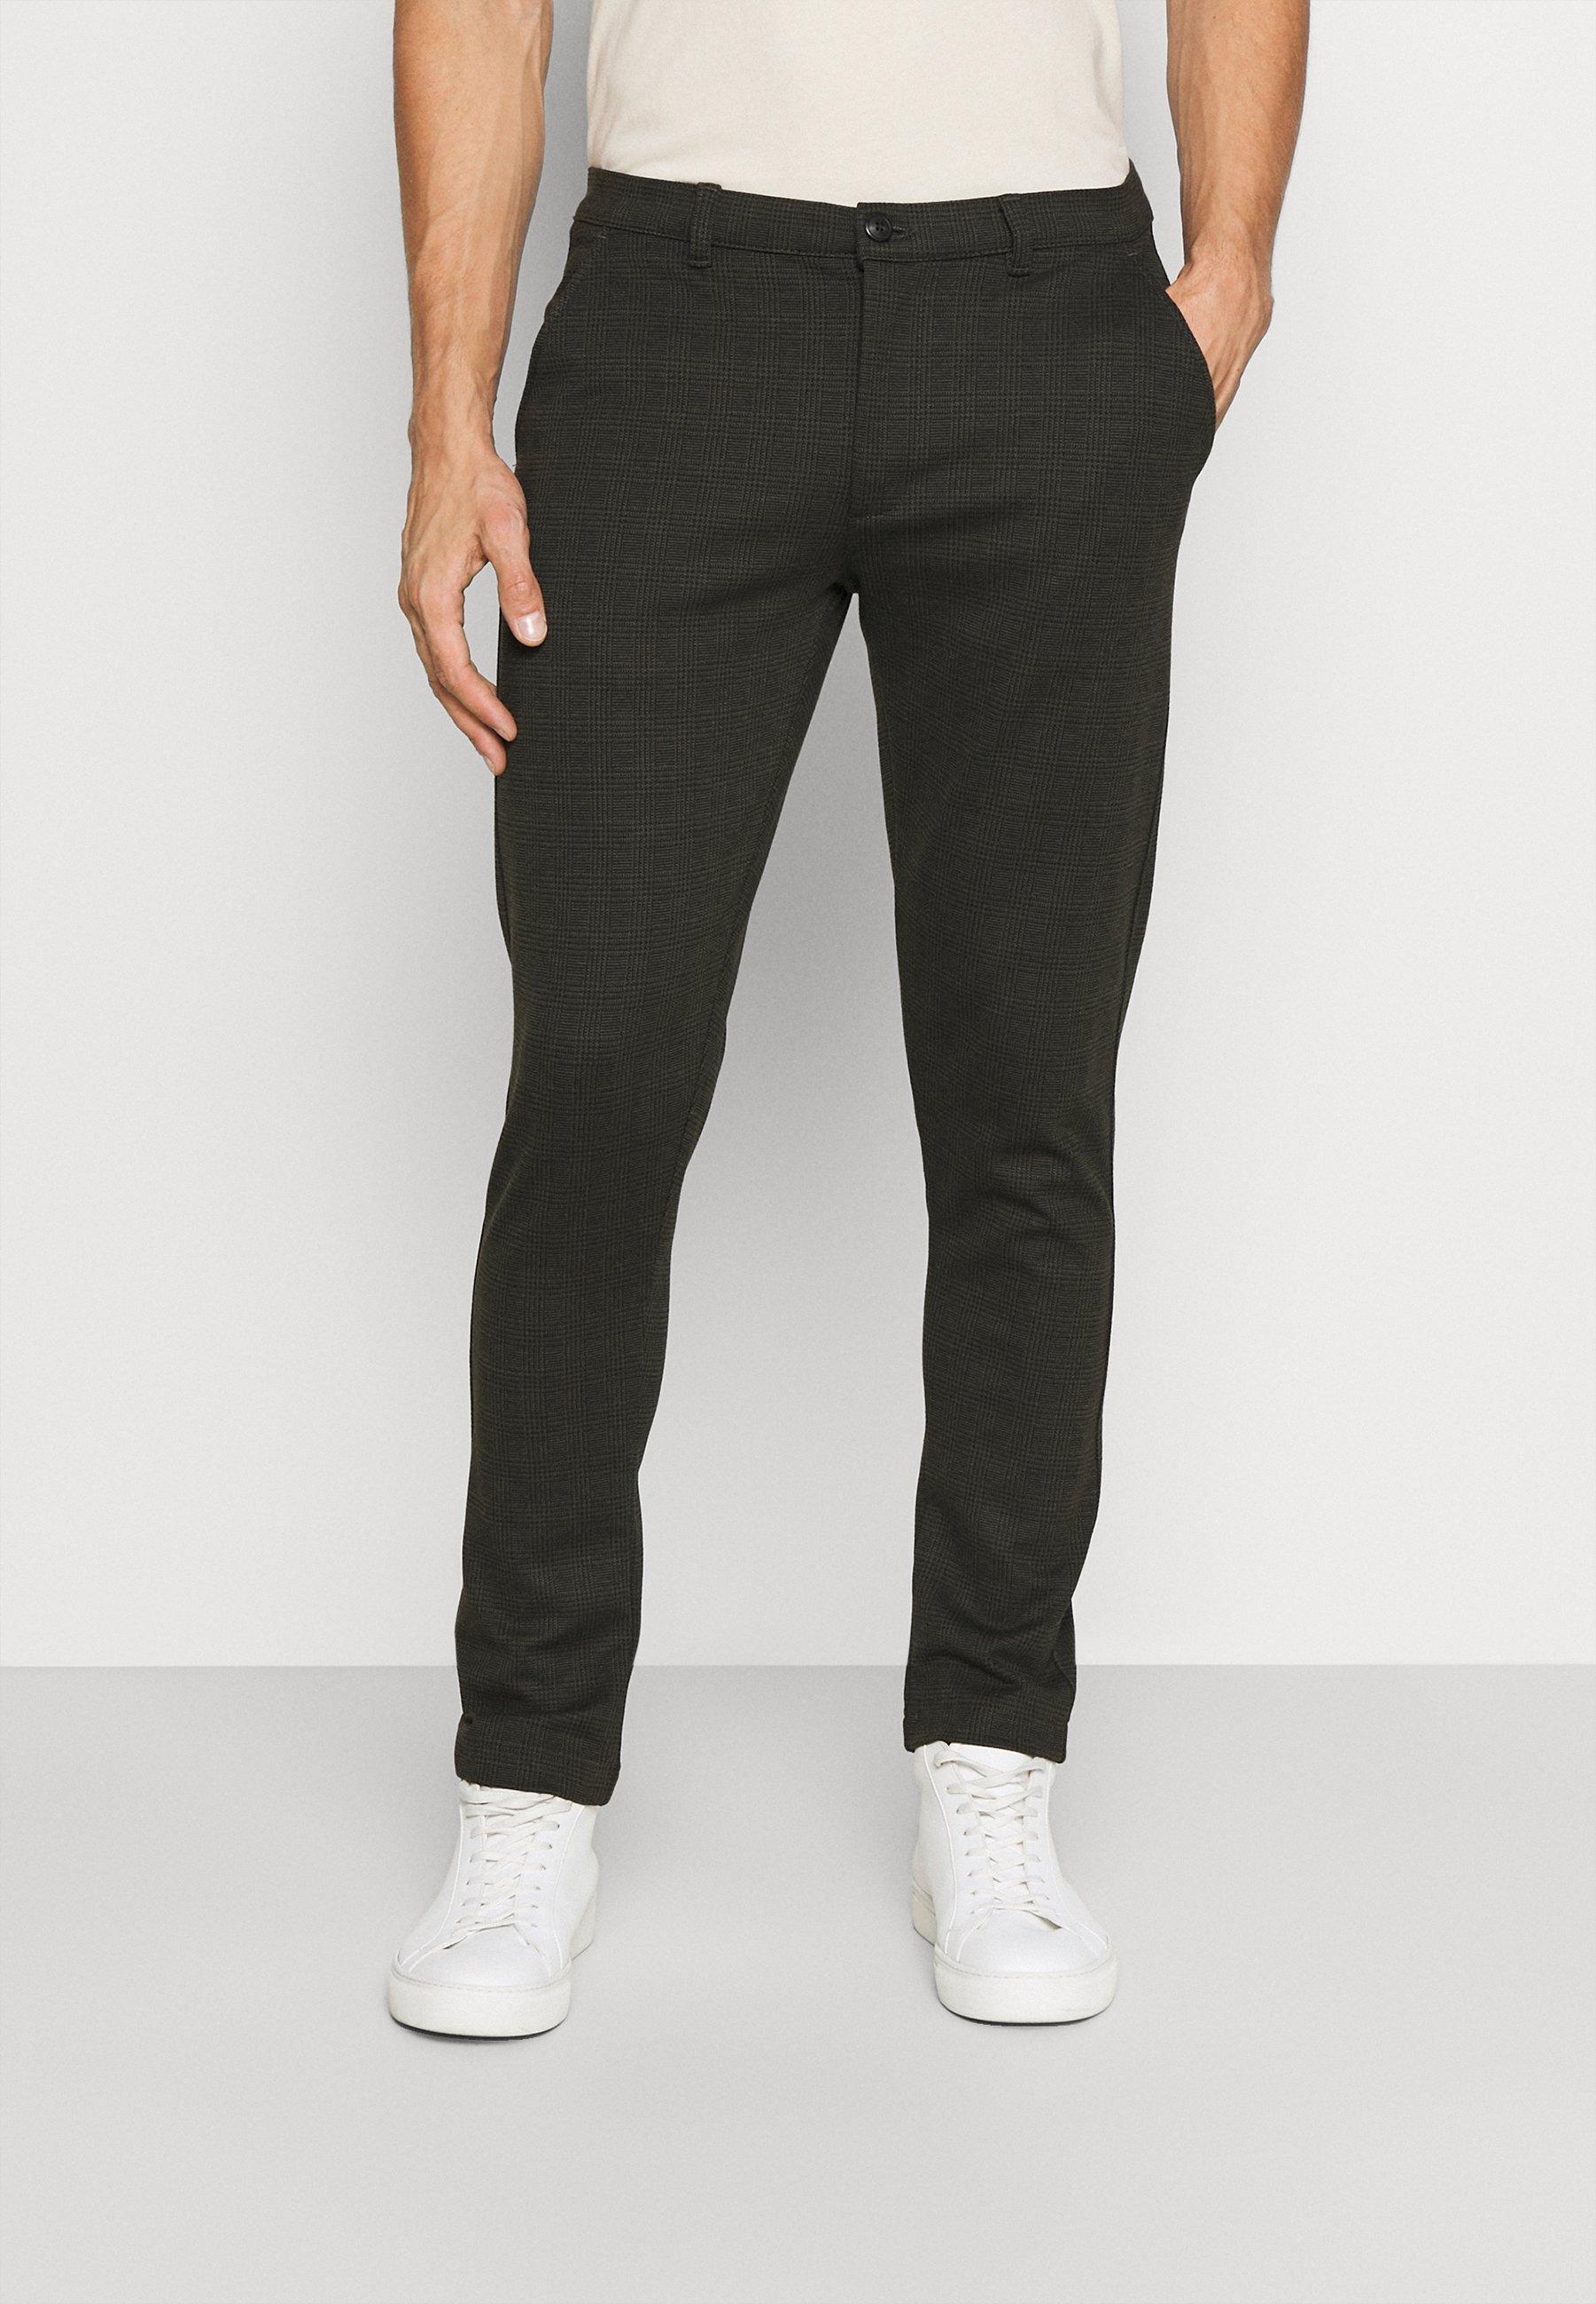 Uomo BARRO CHECK PANT - Pantaloni